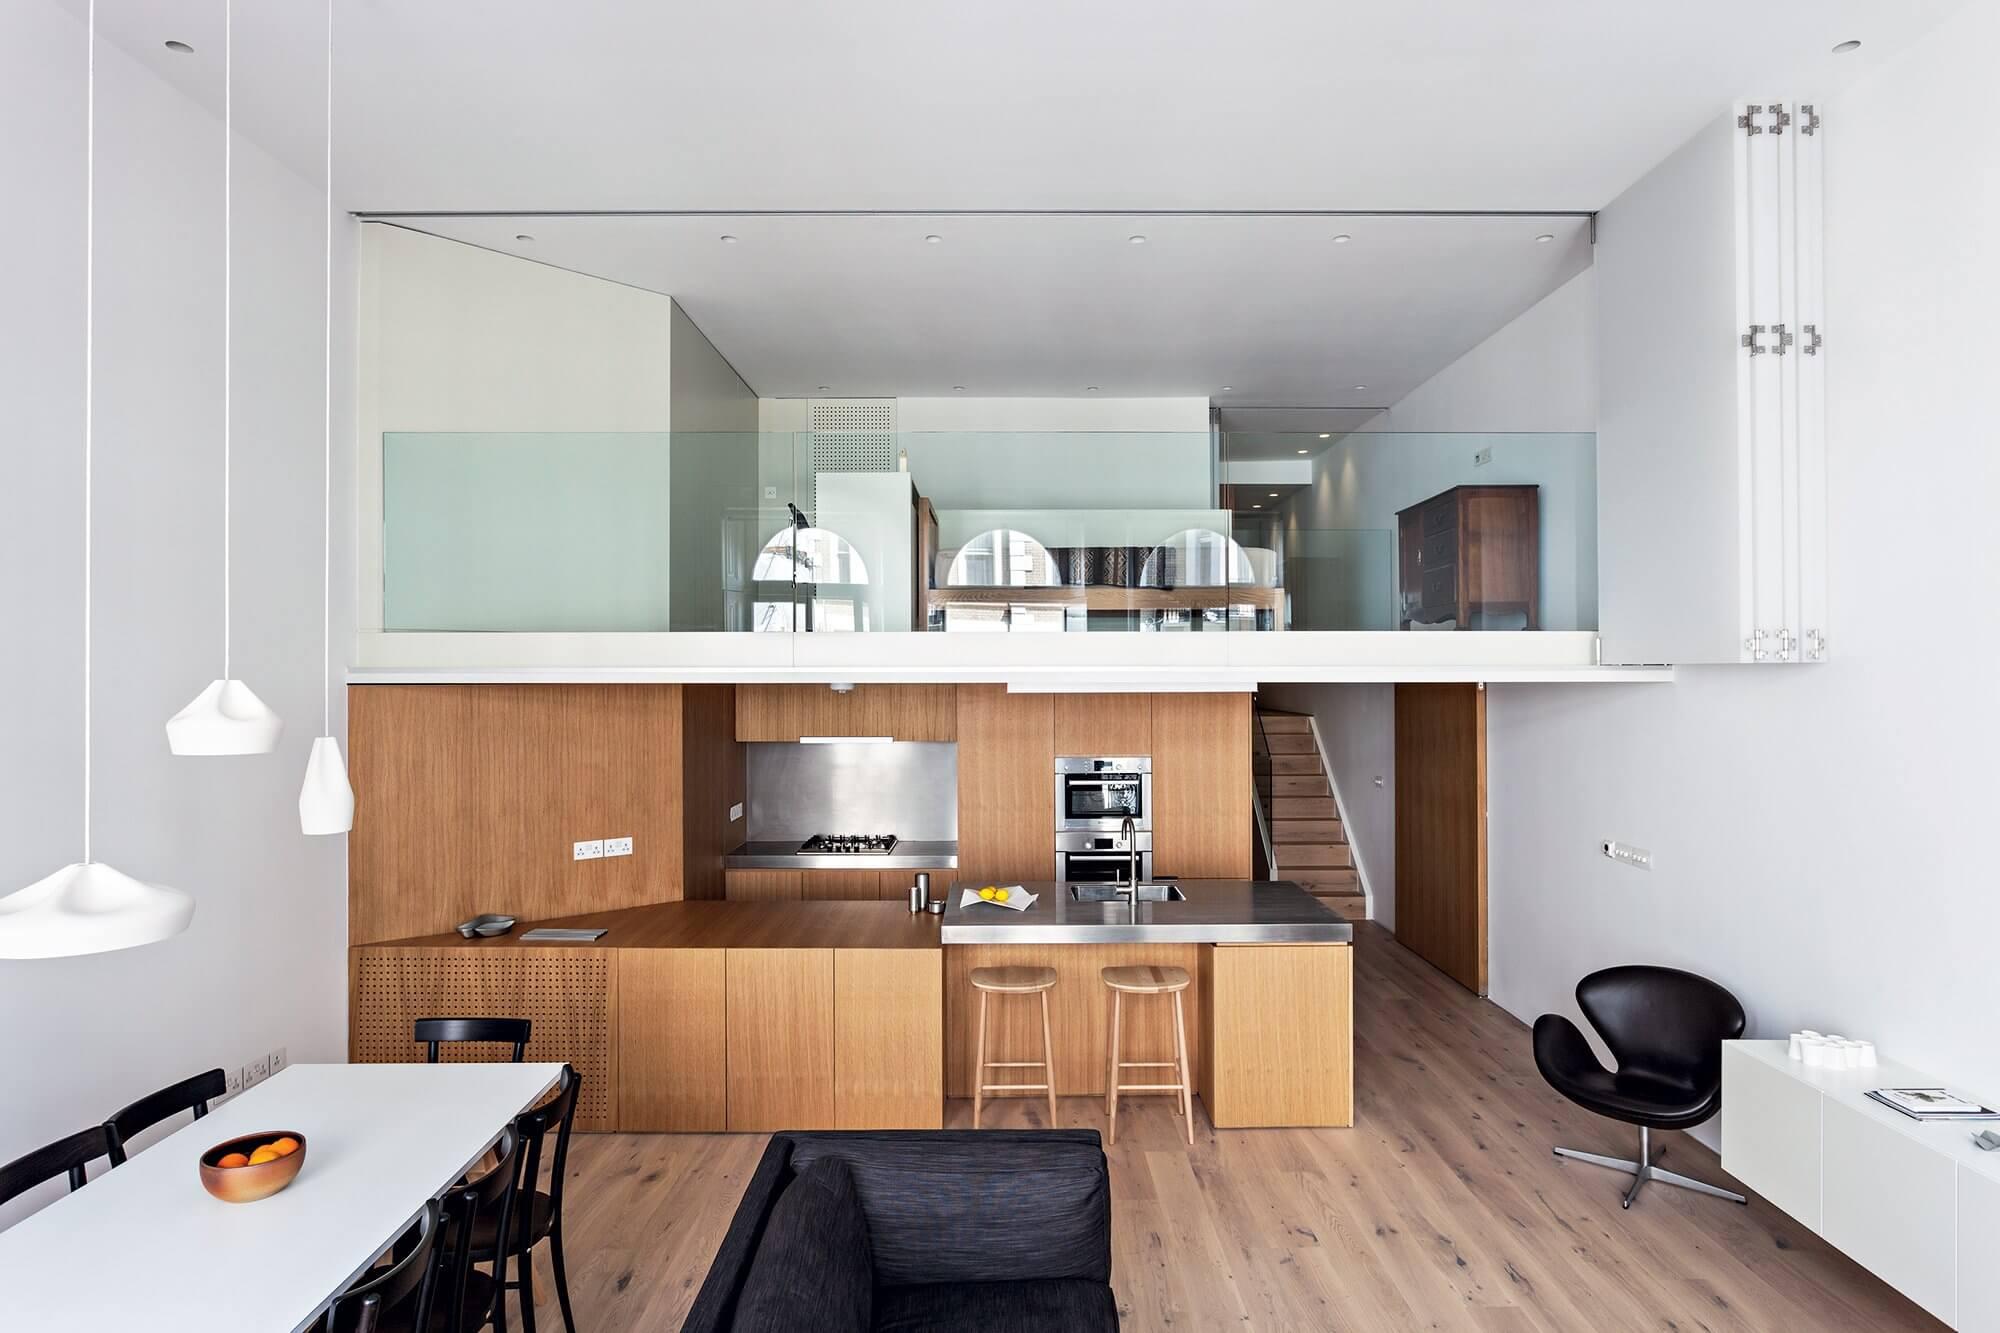 Recommended house design, mezzanine floor